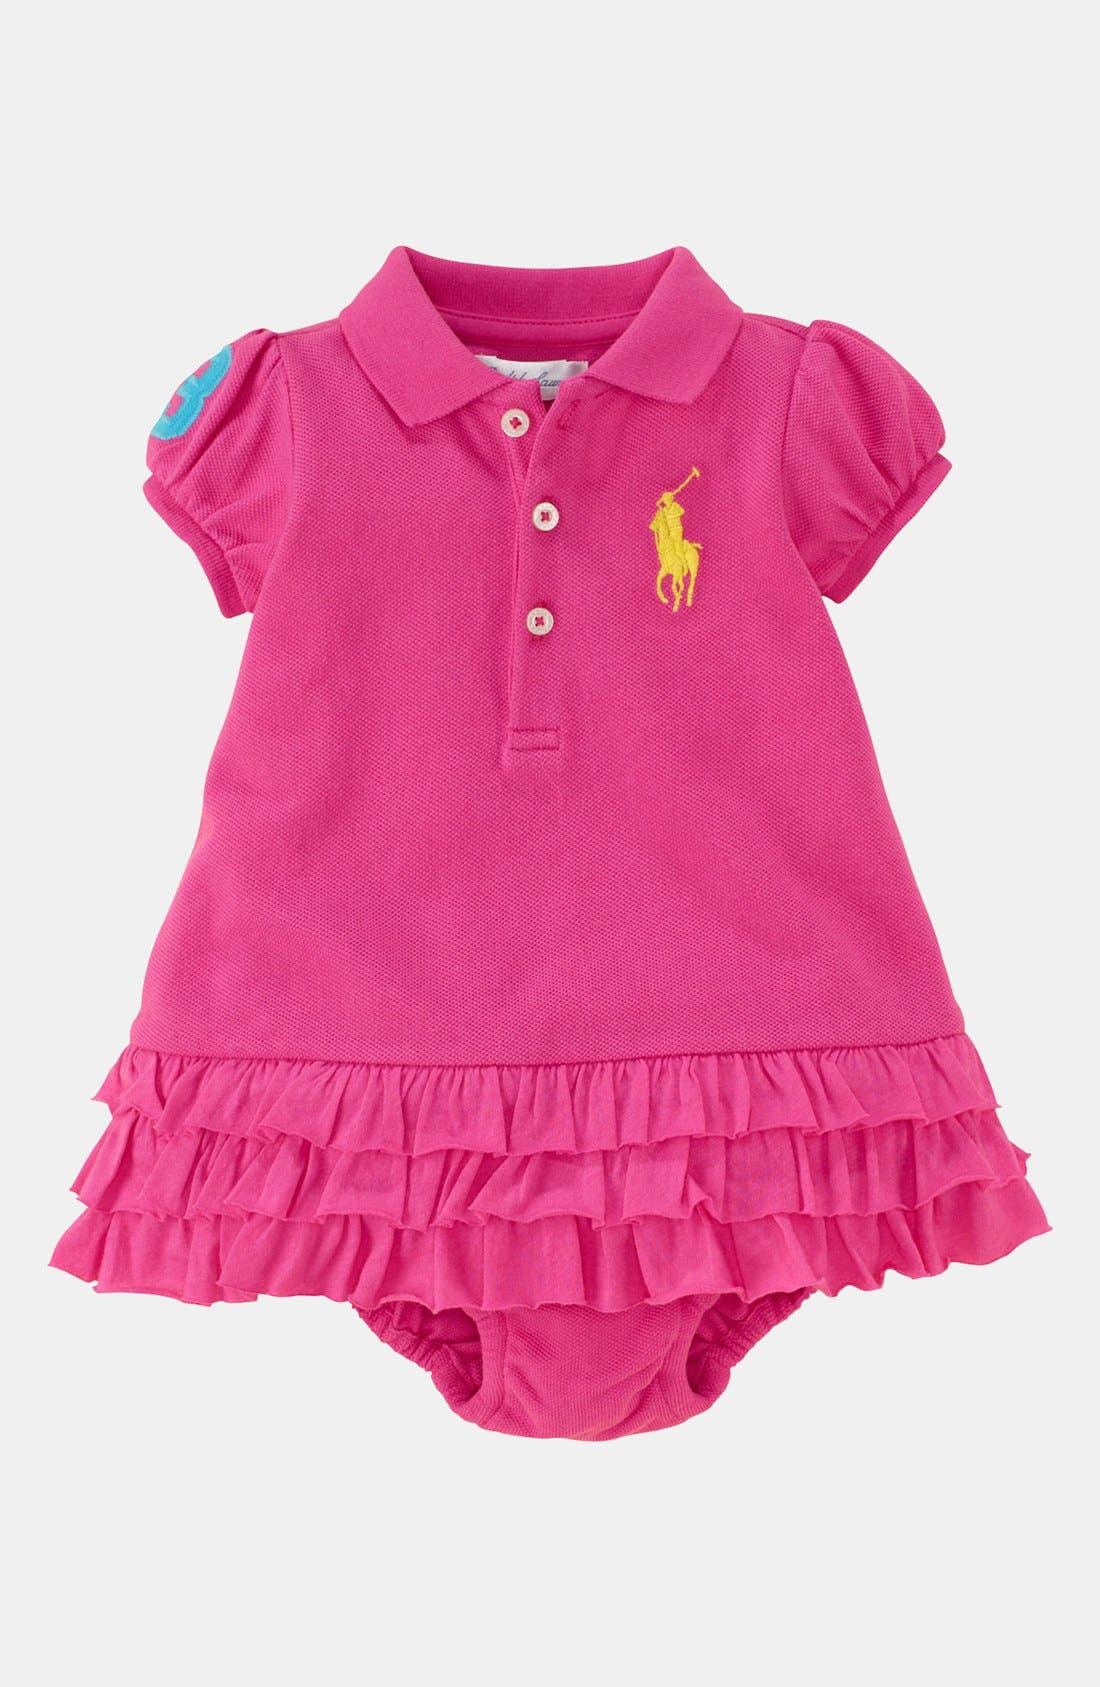 Main Image - Ralph Lauren Polo Dress & Bloomers (Baby)